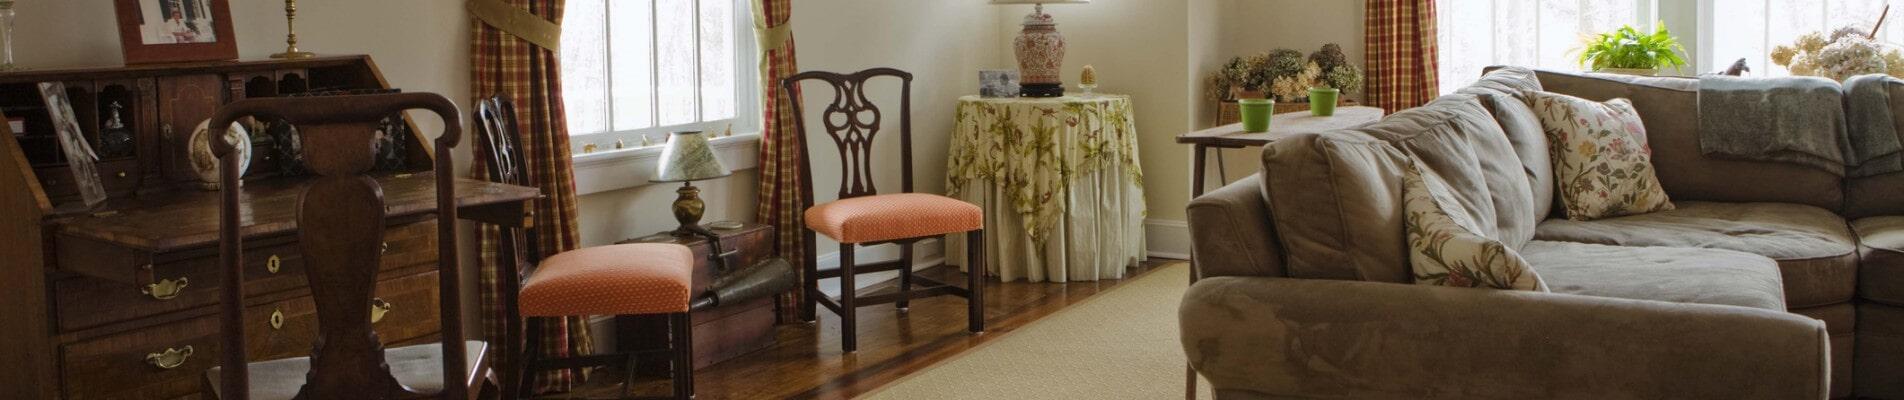 Merveilleux Furniture Store   Hanover, PA   Tiptonu0027s New U0026 Used Furniture